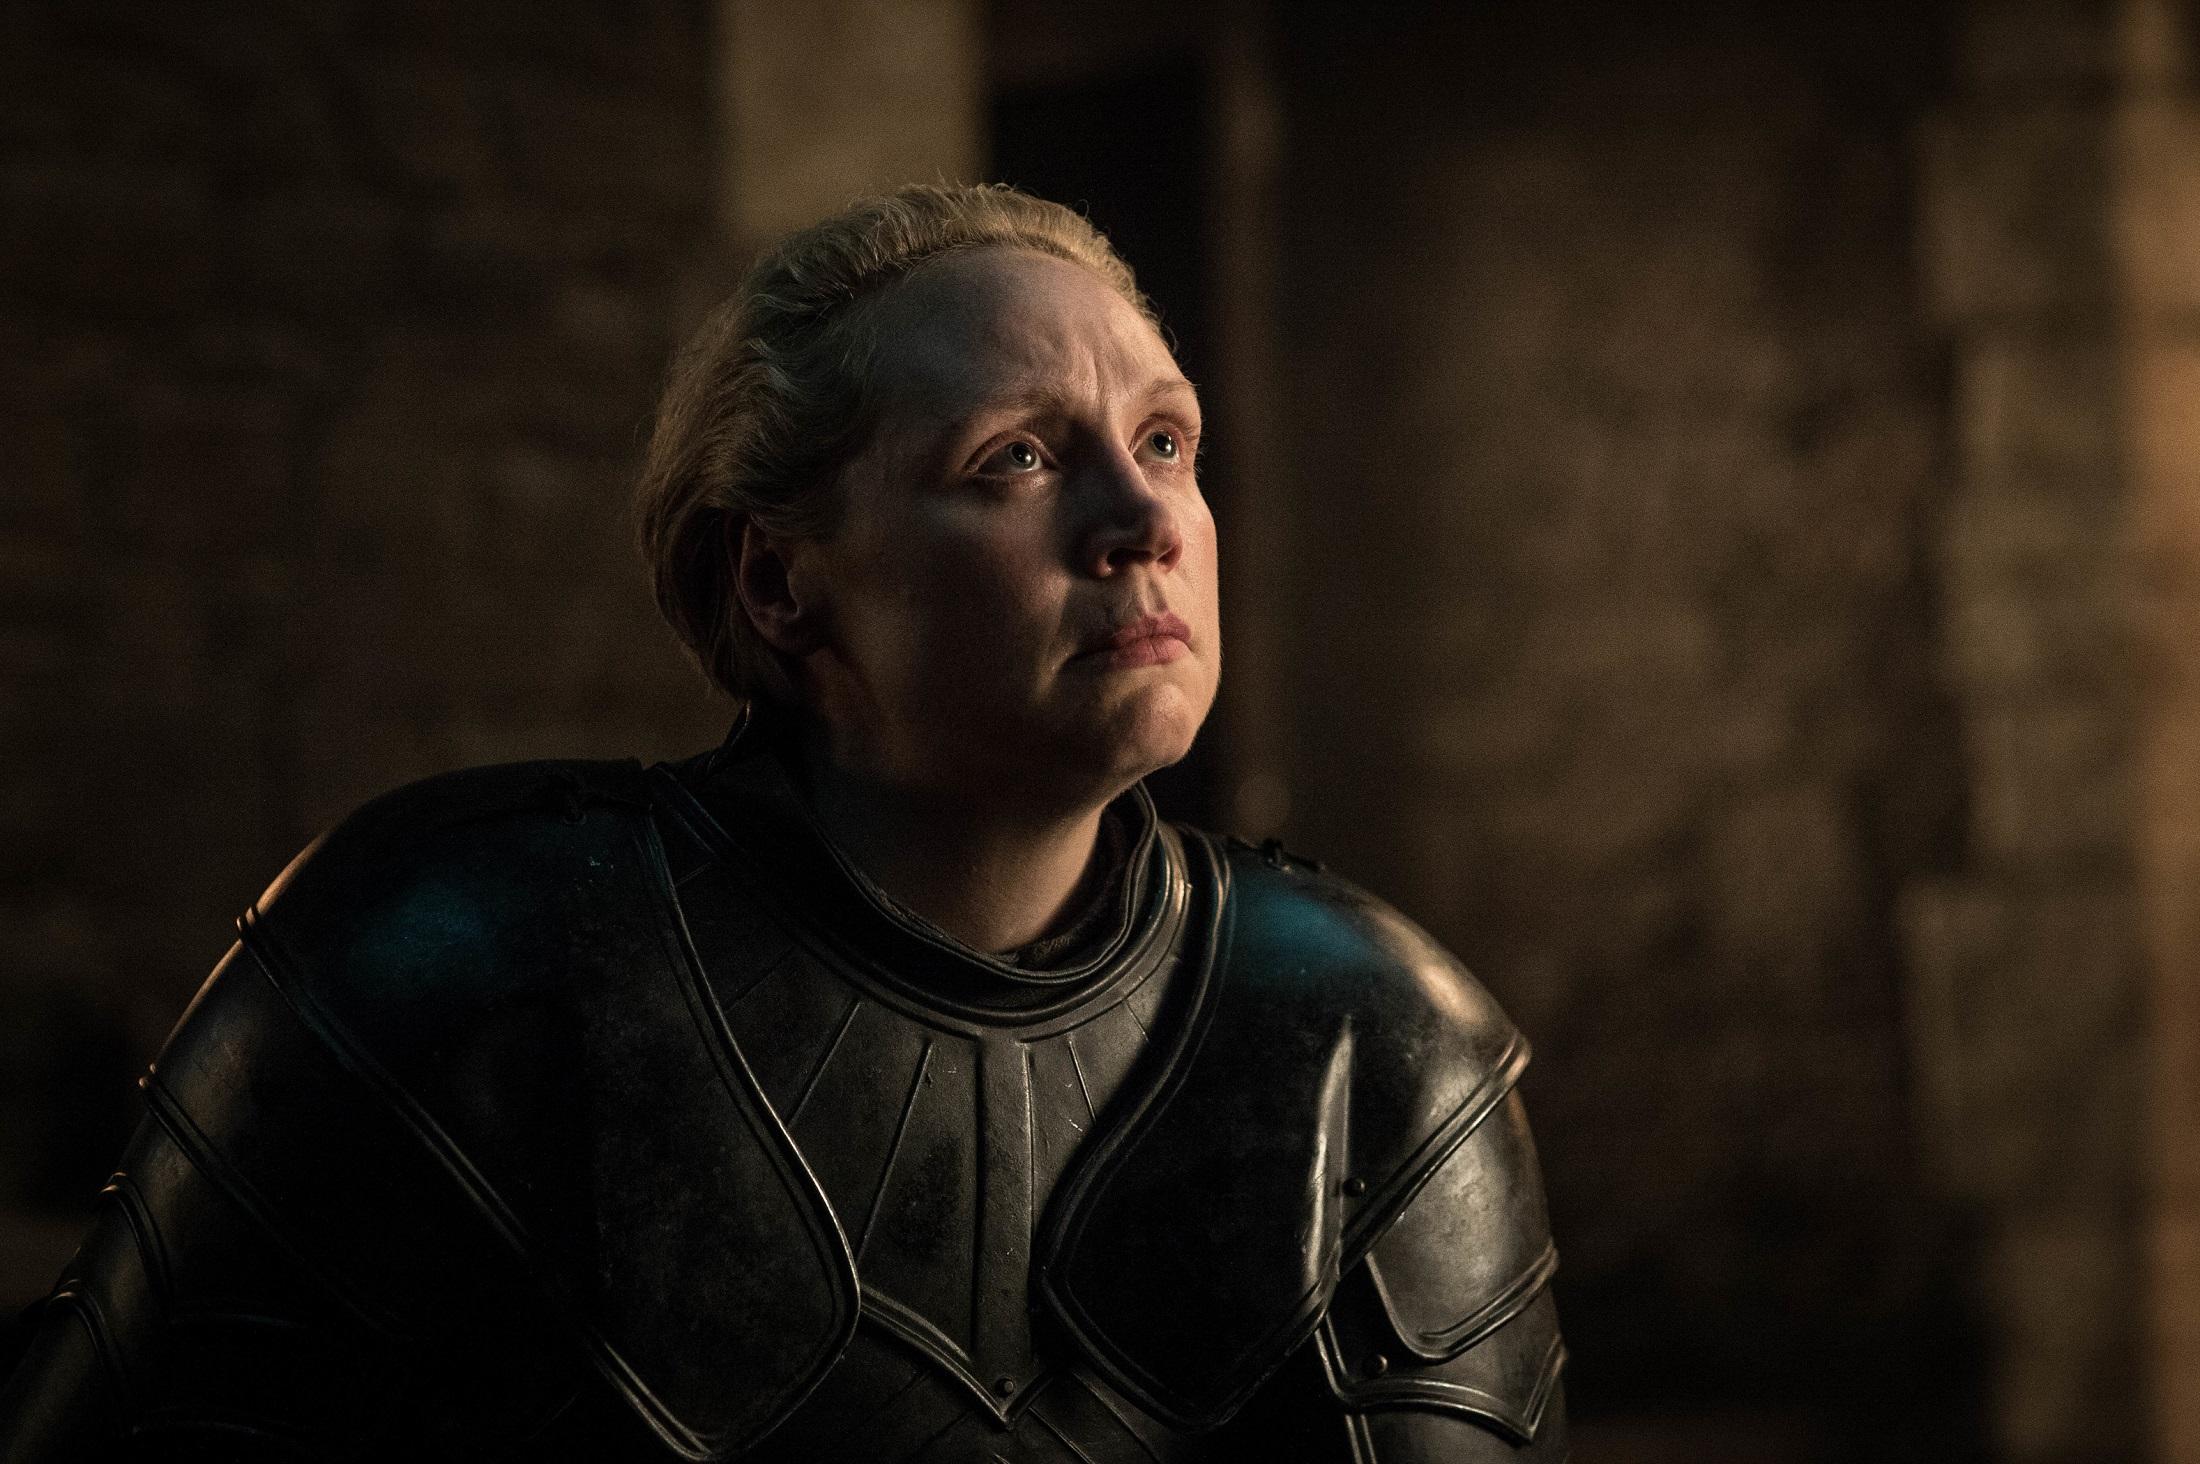 Brienne knight